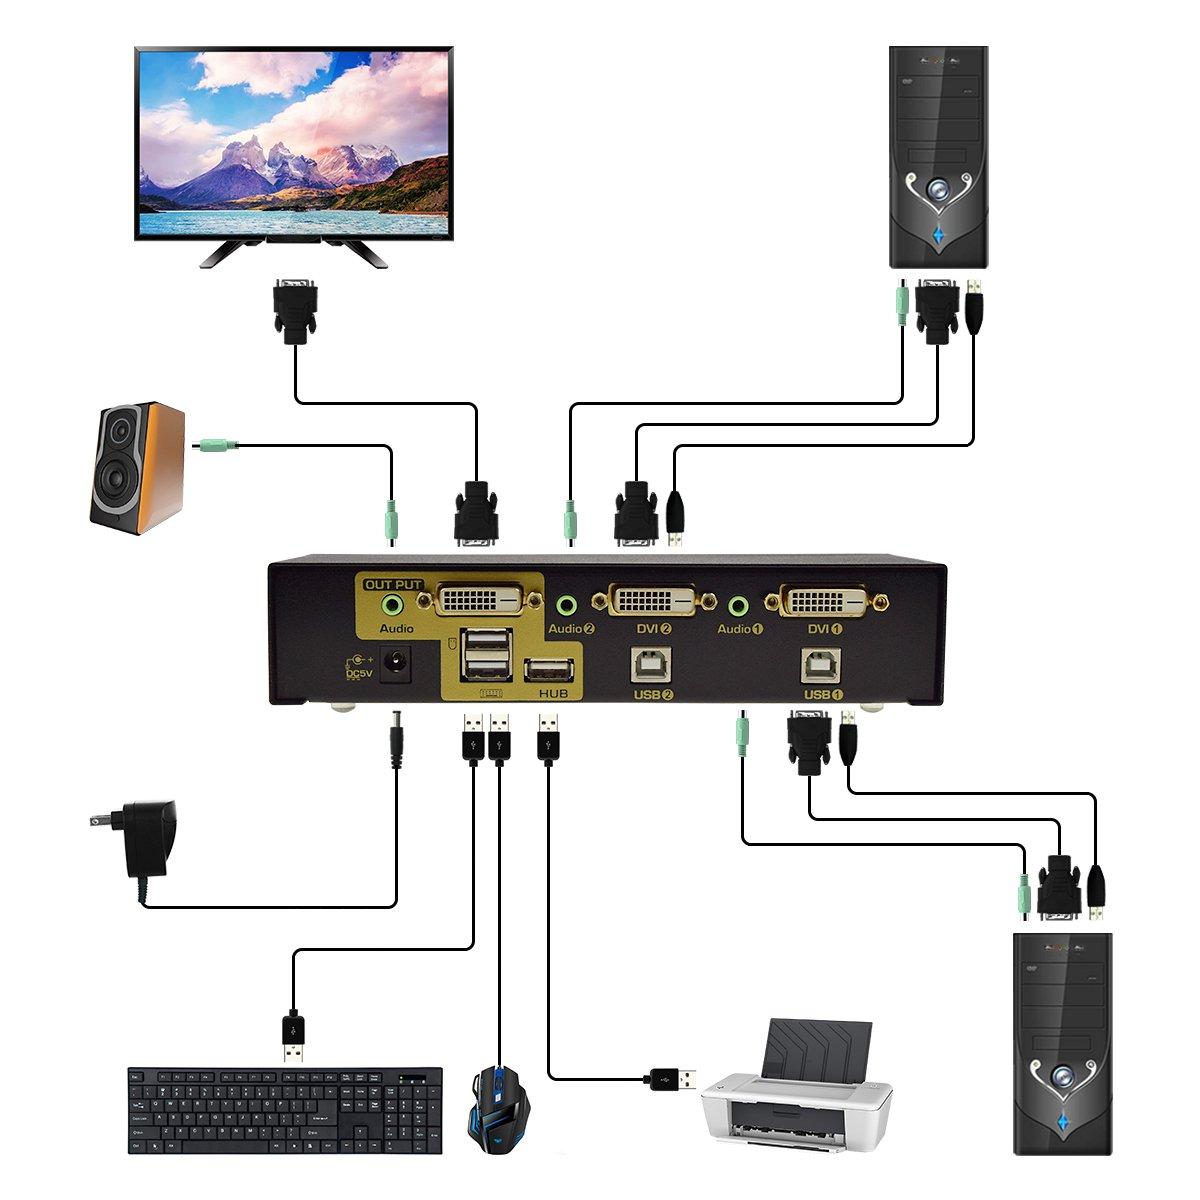 2-Port USB DVI KVM Switch with Audio for DVI Computers External ...